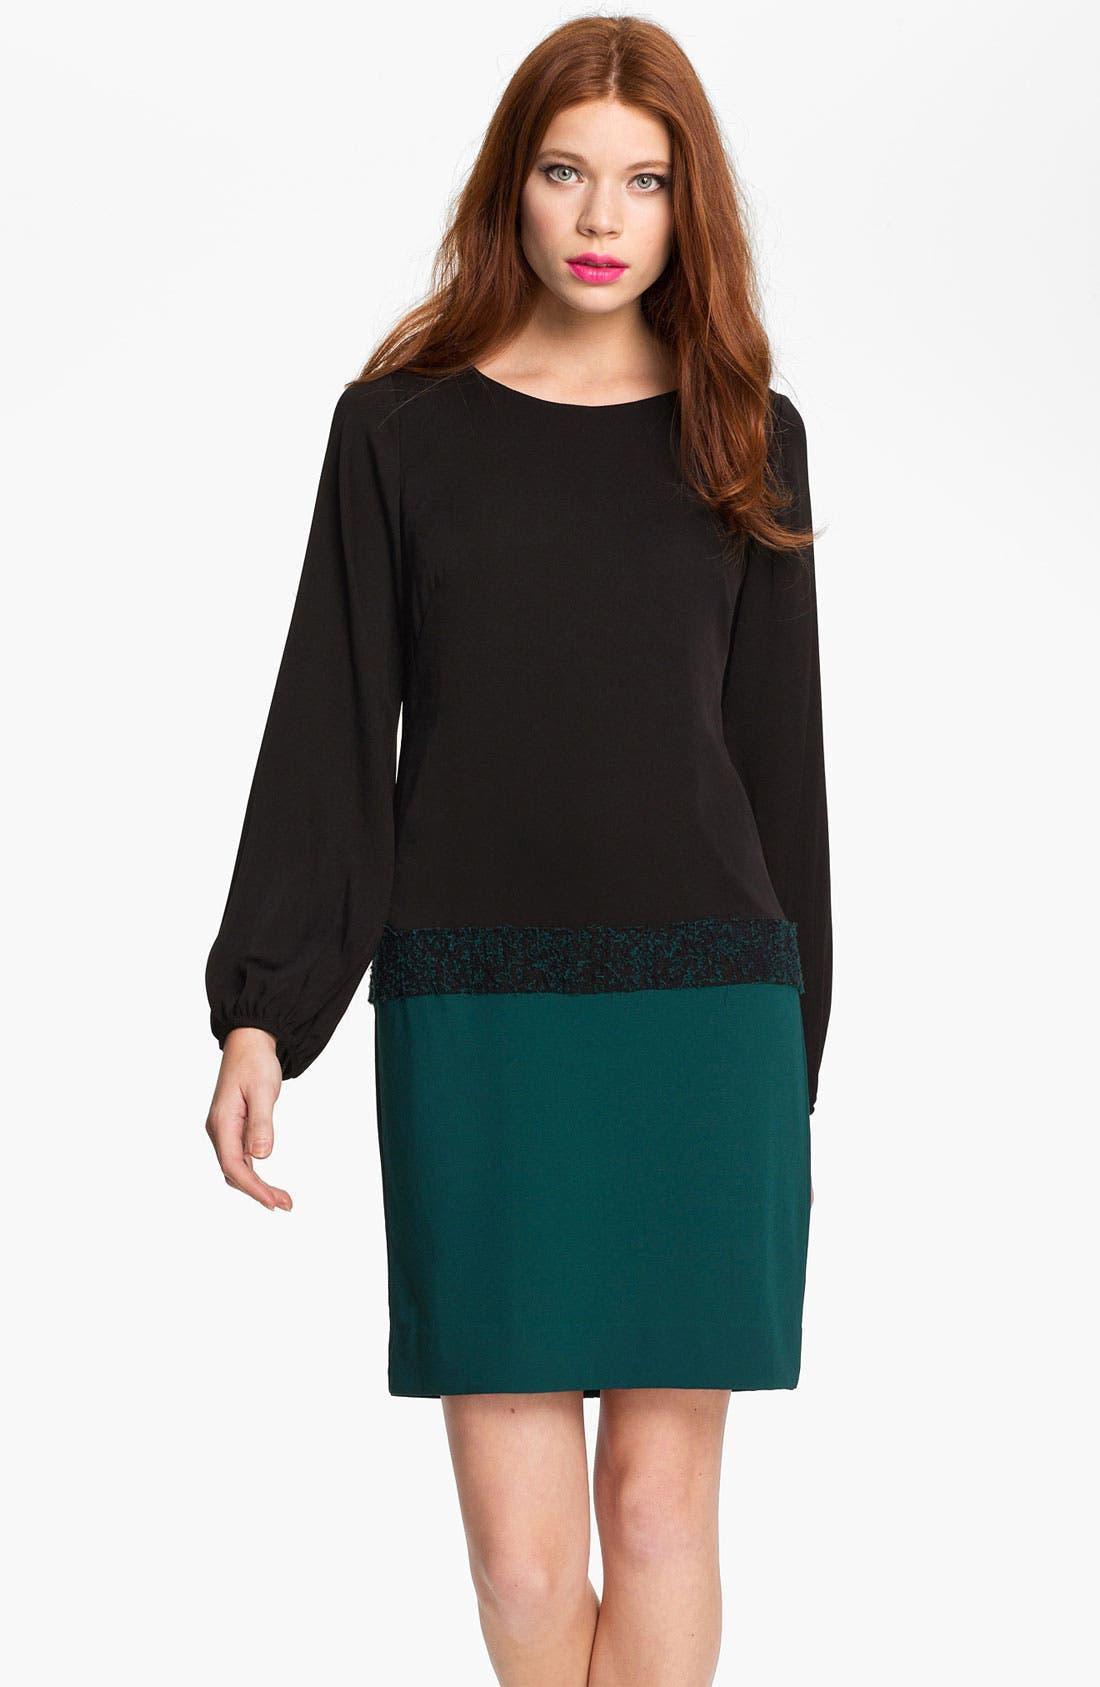 Alternate Image 1 Selected - Nicole Miller Blouson Sleeve Colorblock Crepe Dress